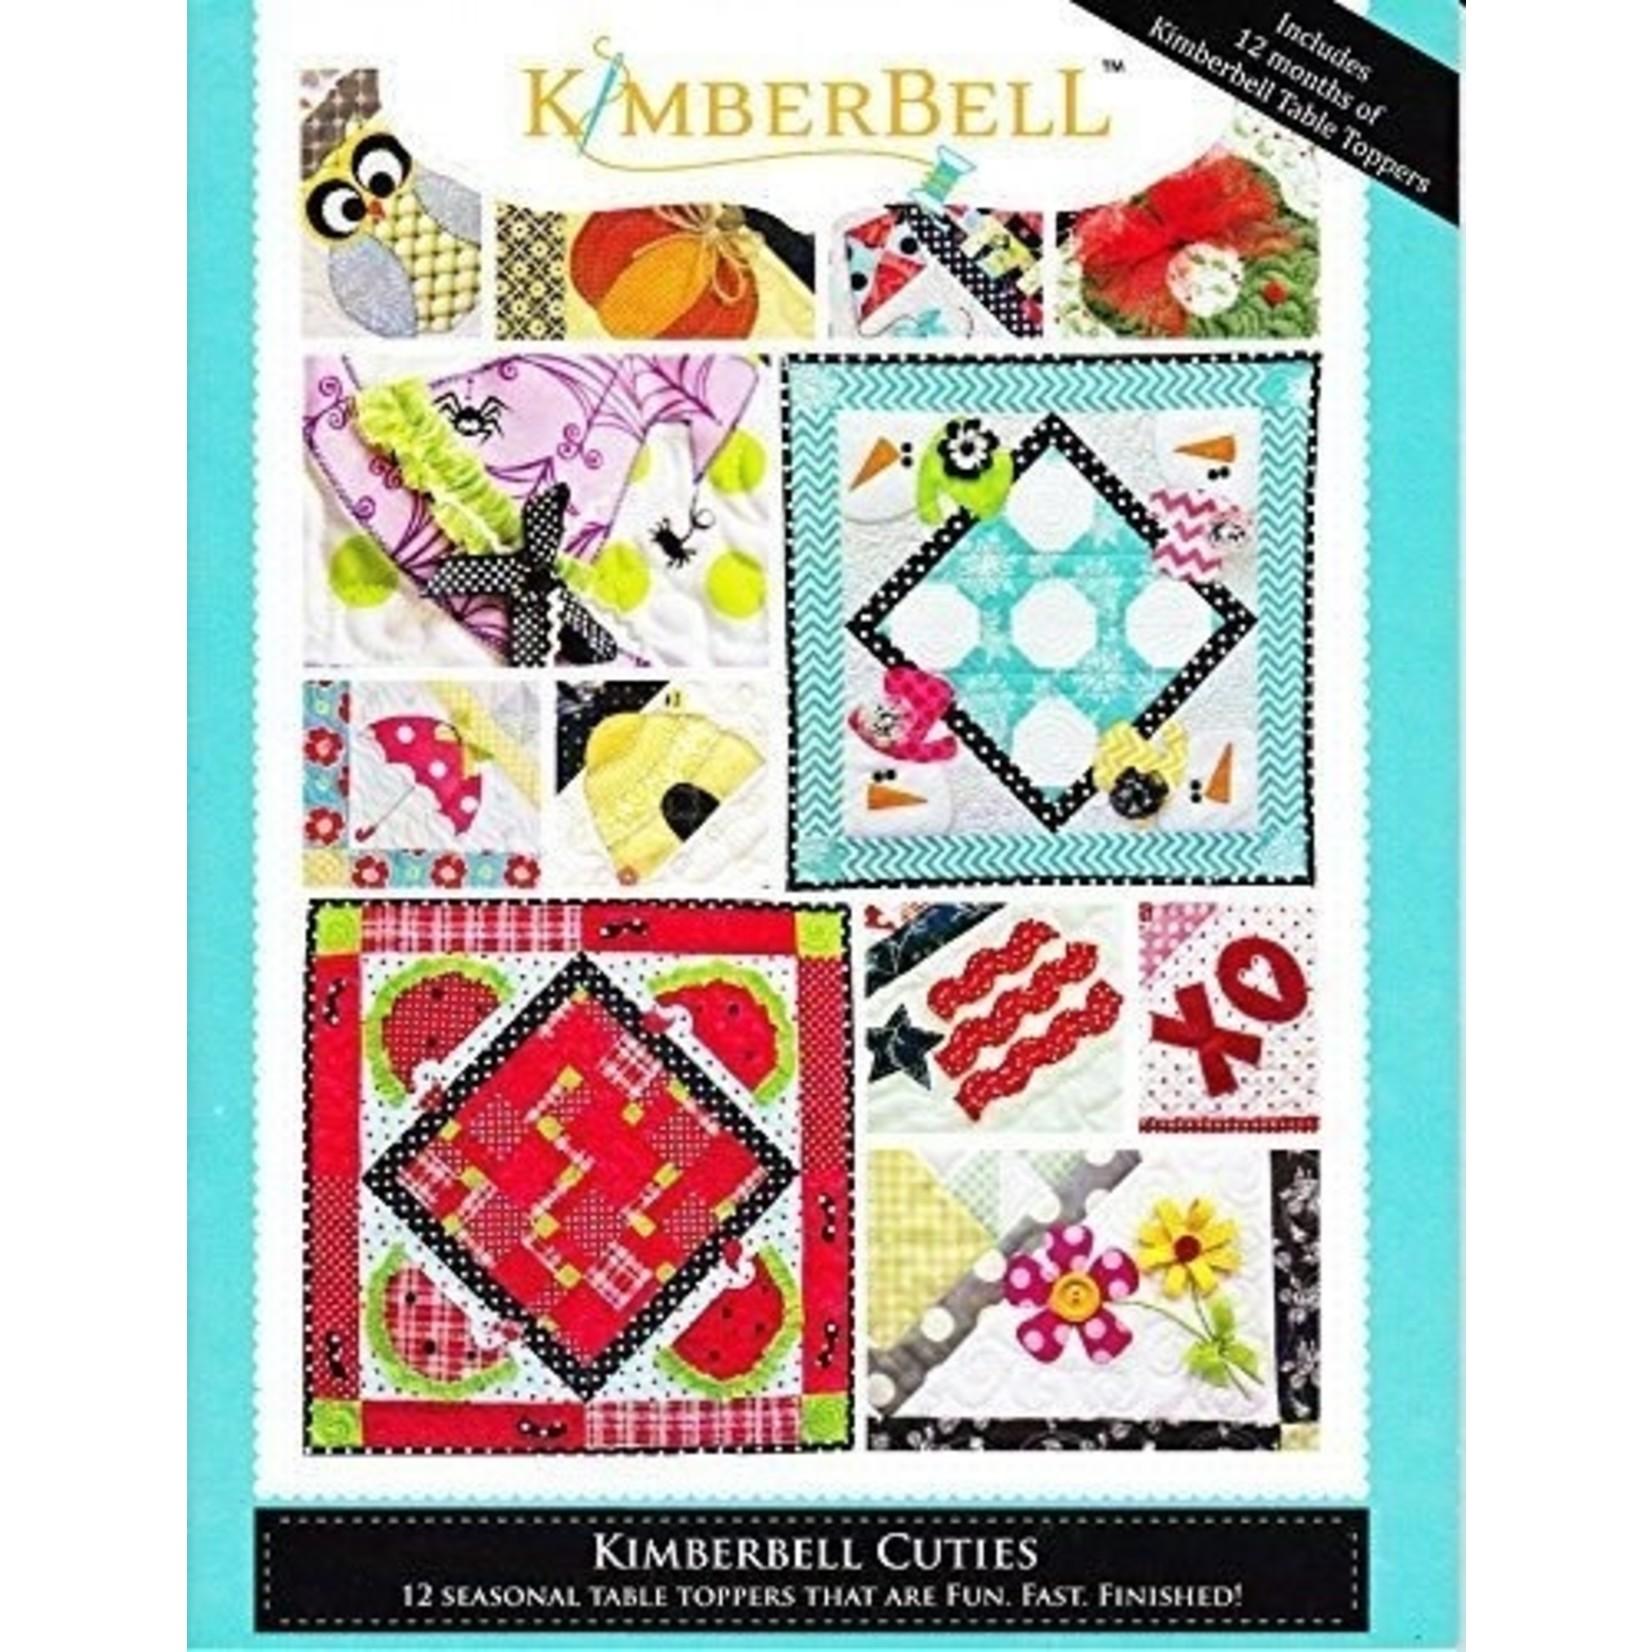 Kimberbell Designs KIMBERBELL CUTIES 12 SEASONAL TABLE TOPPERS